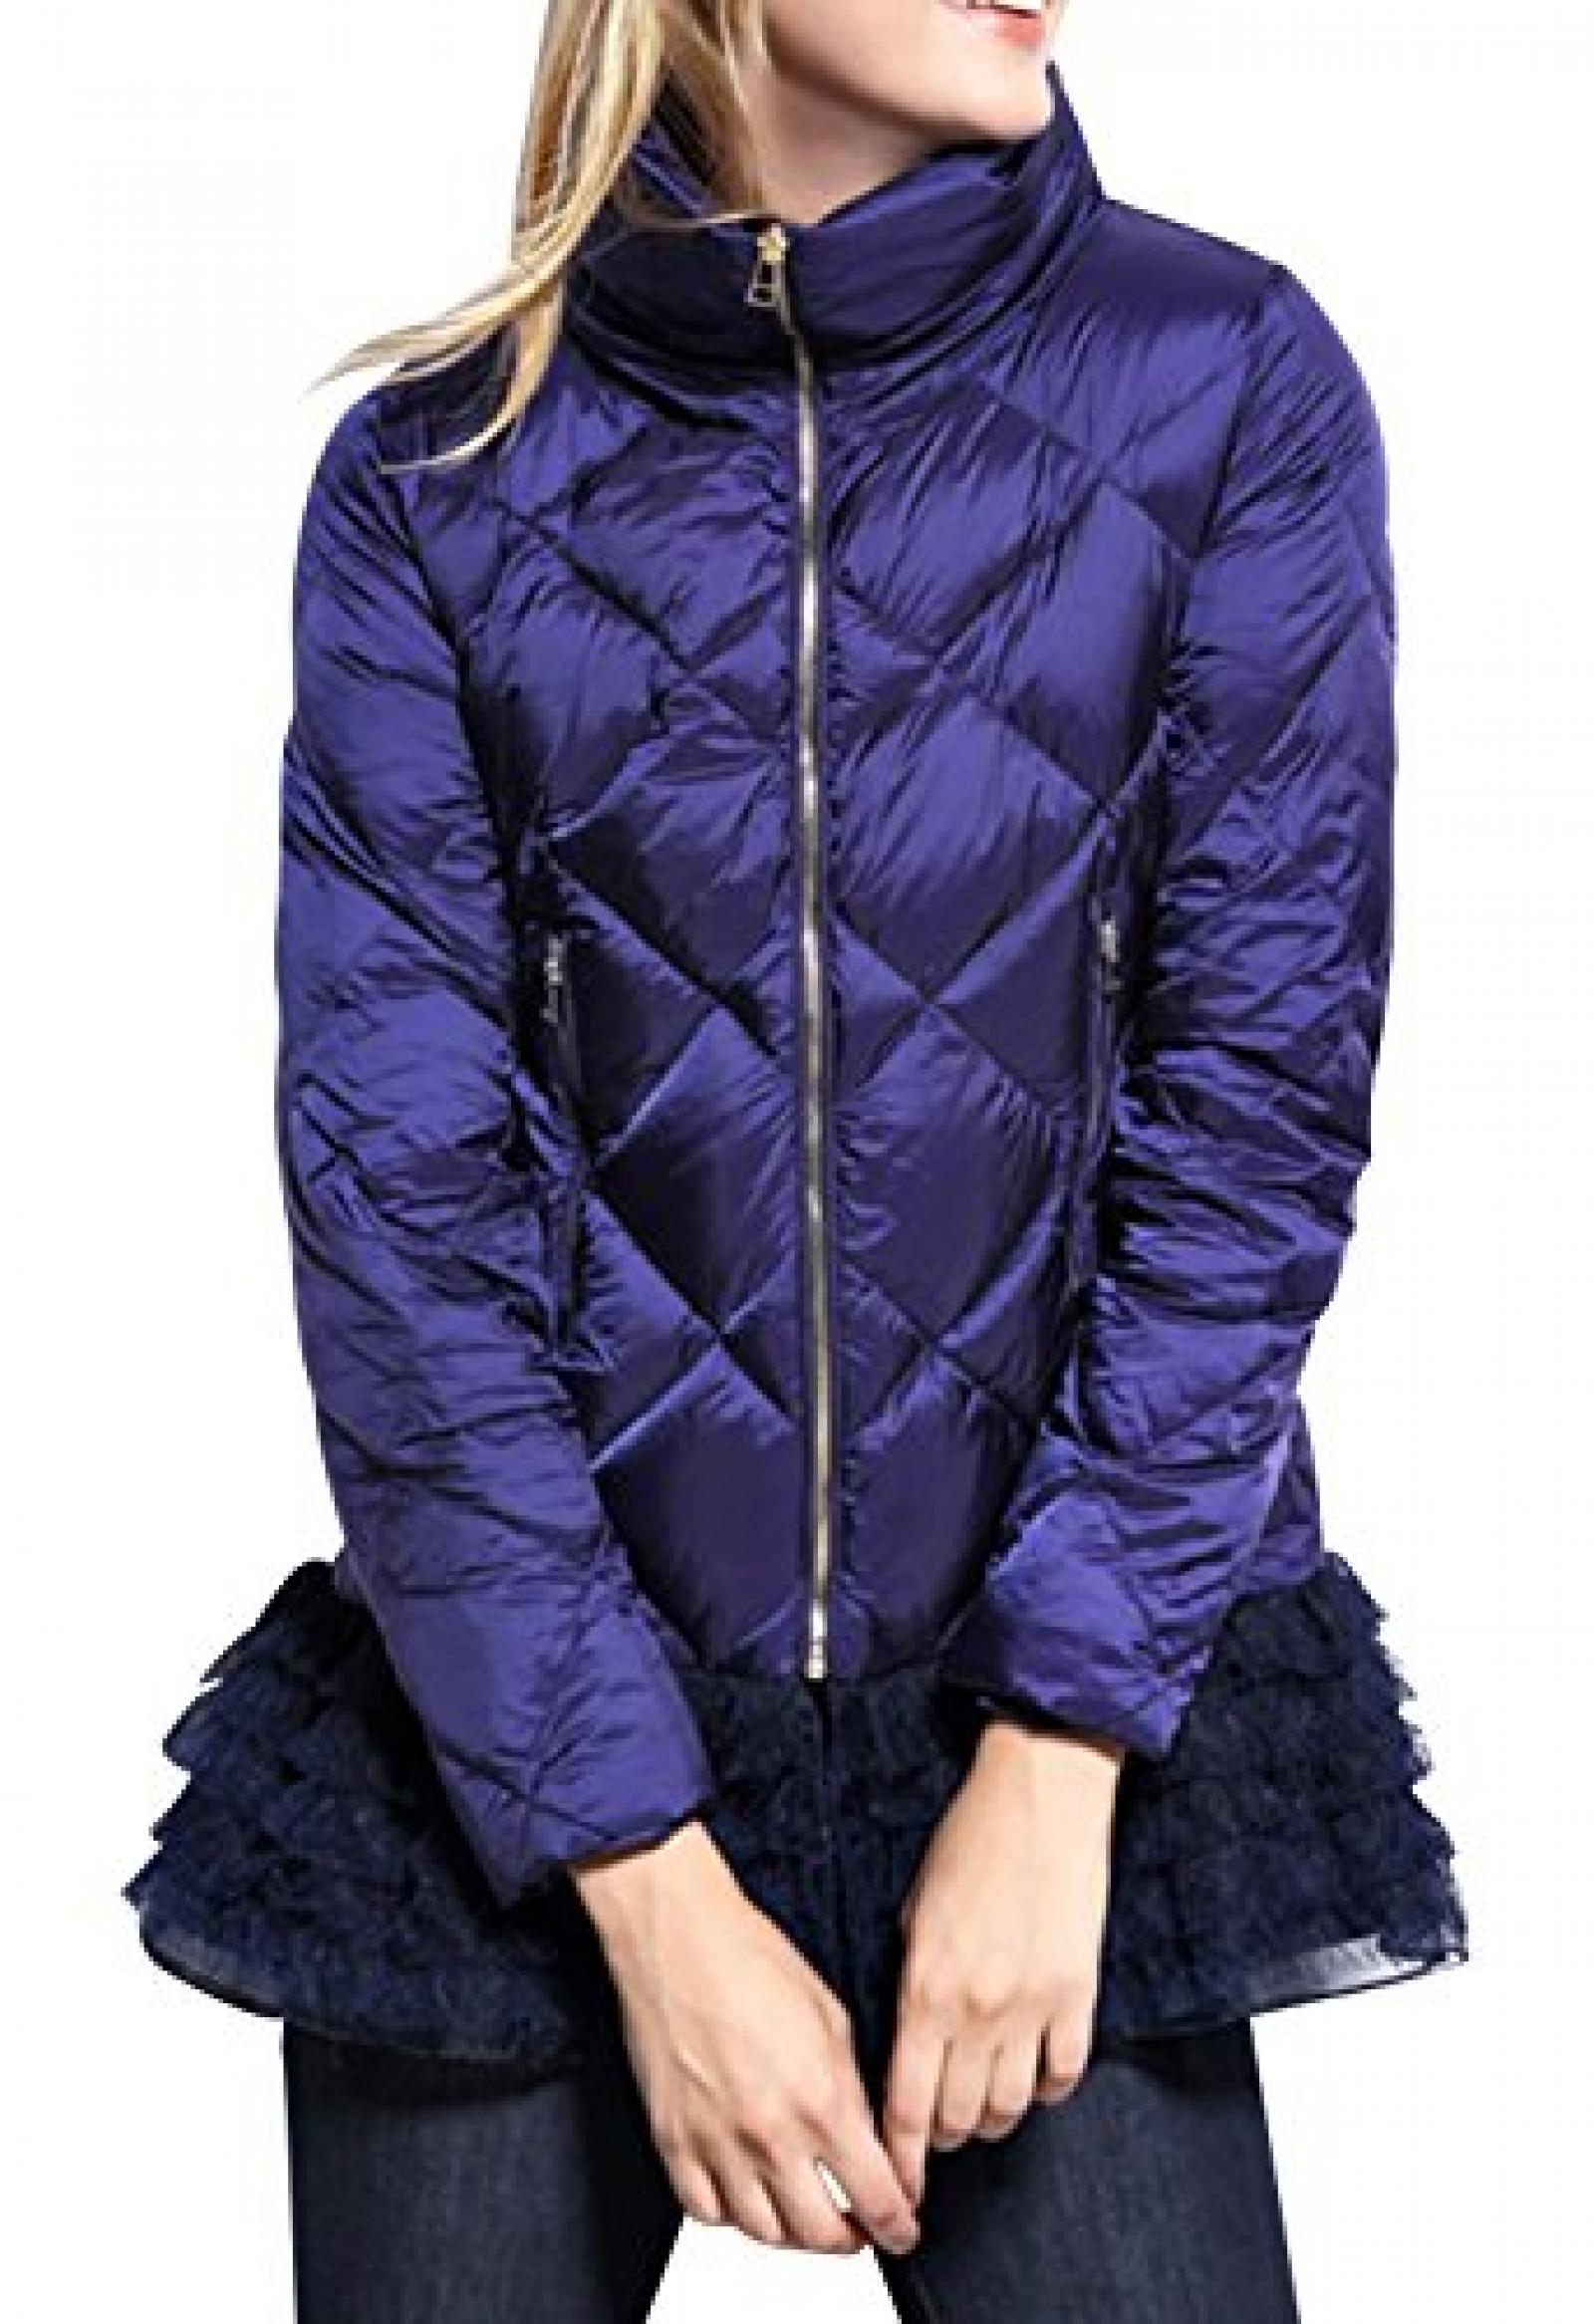 HD Damen Daunenjacke Leicht Winterjacke Steppjacke Patchwork Kariert Trends Fashion